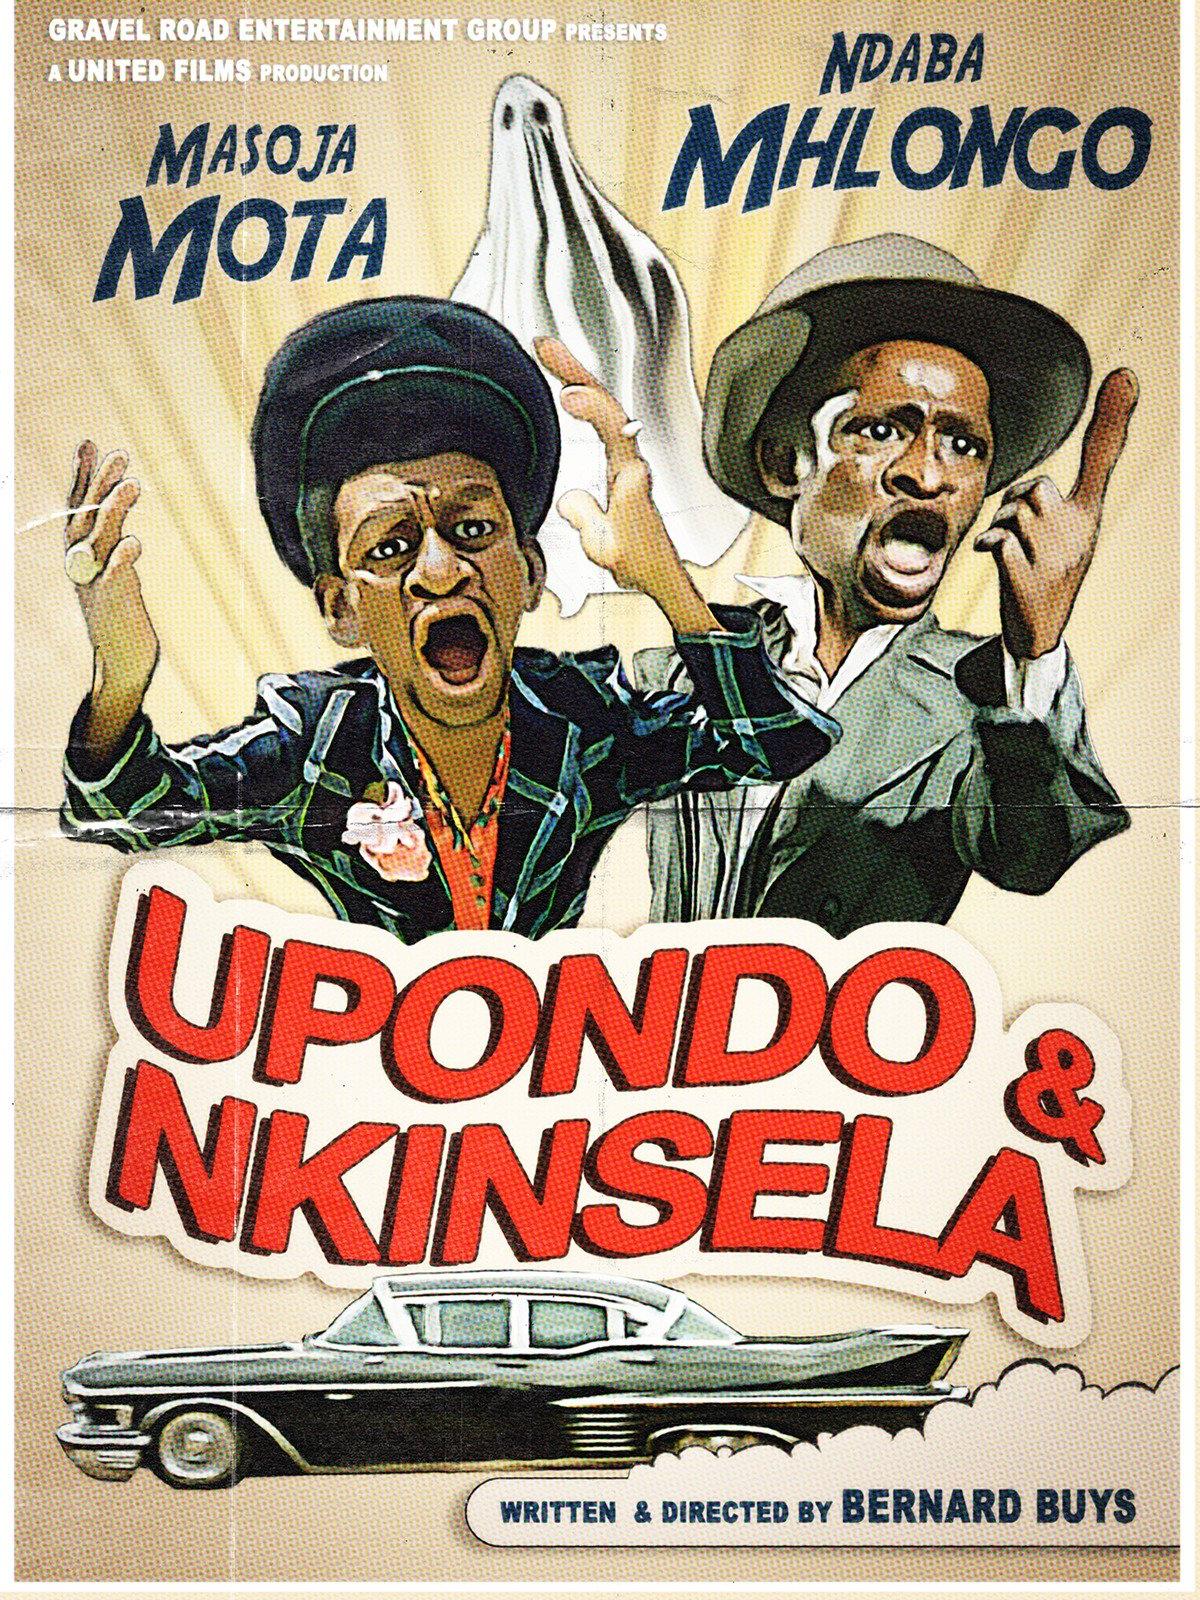 Upondo & Nkinsela